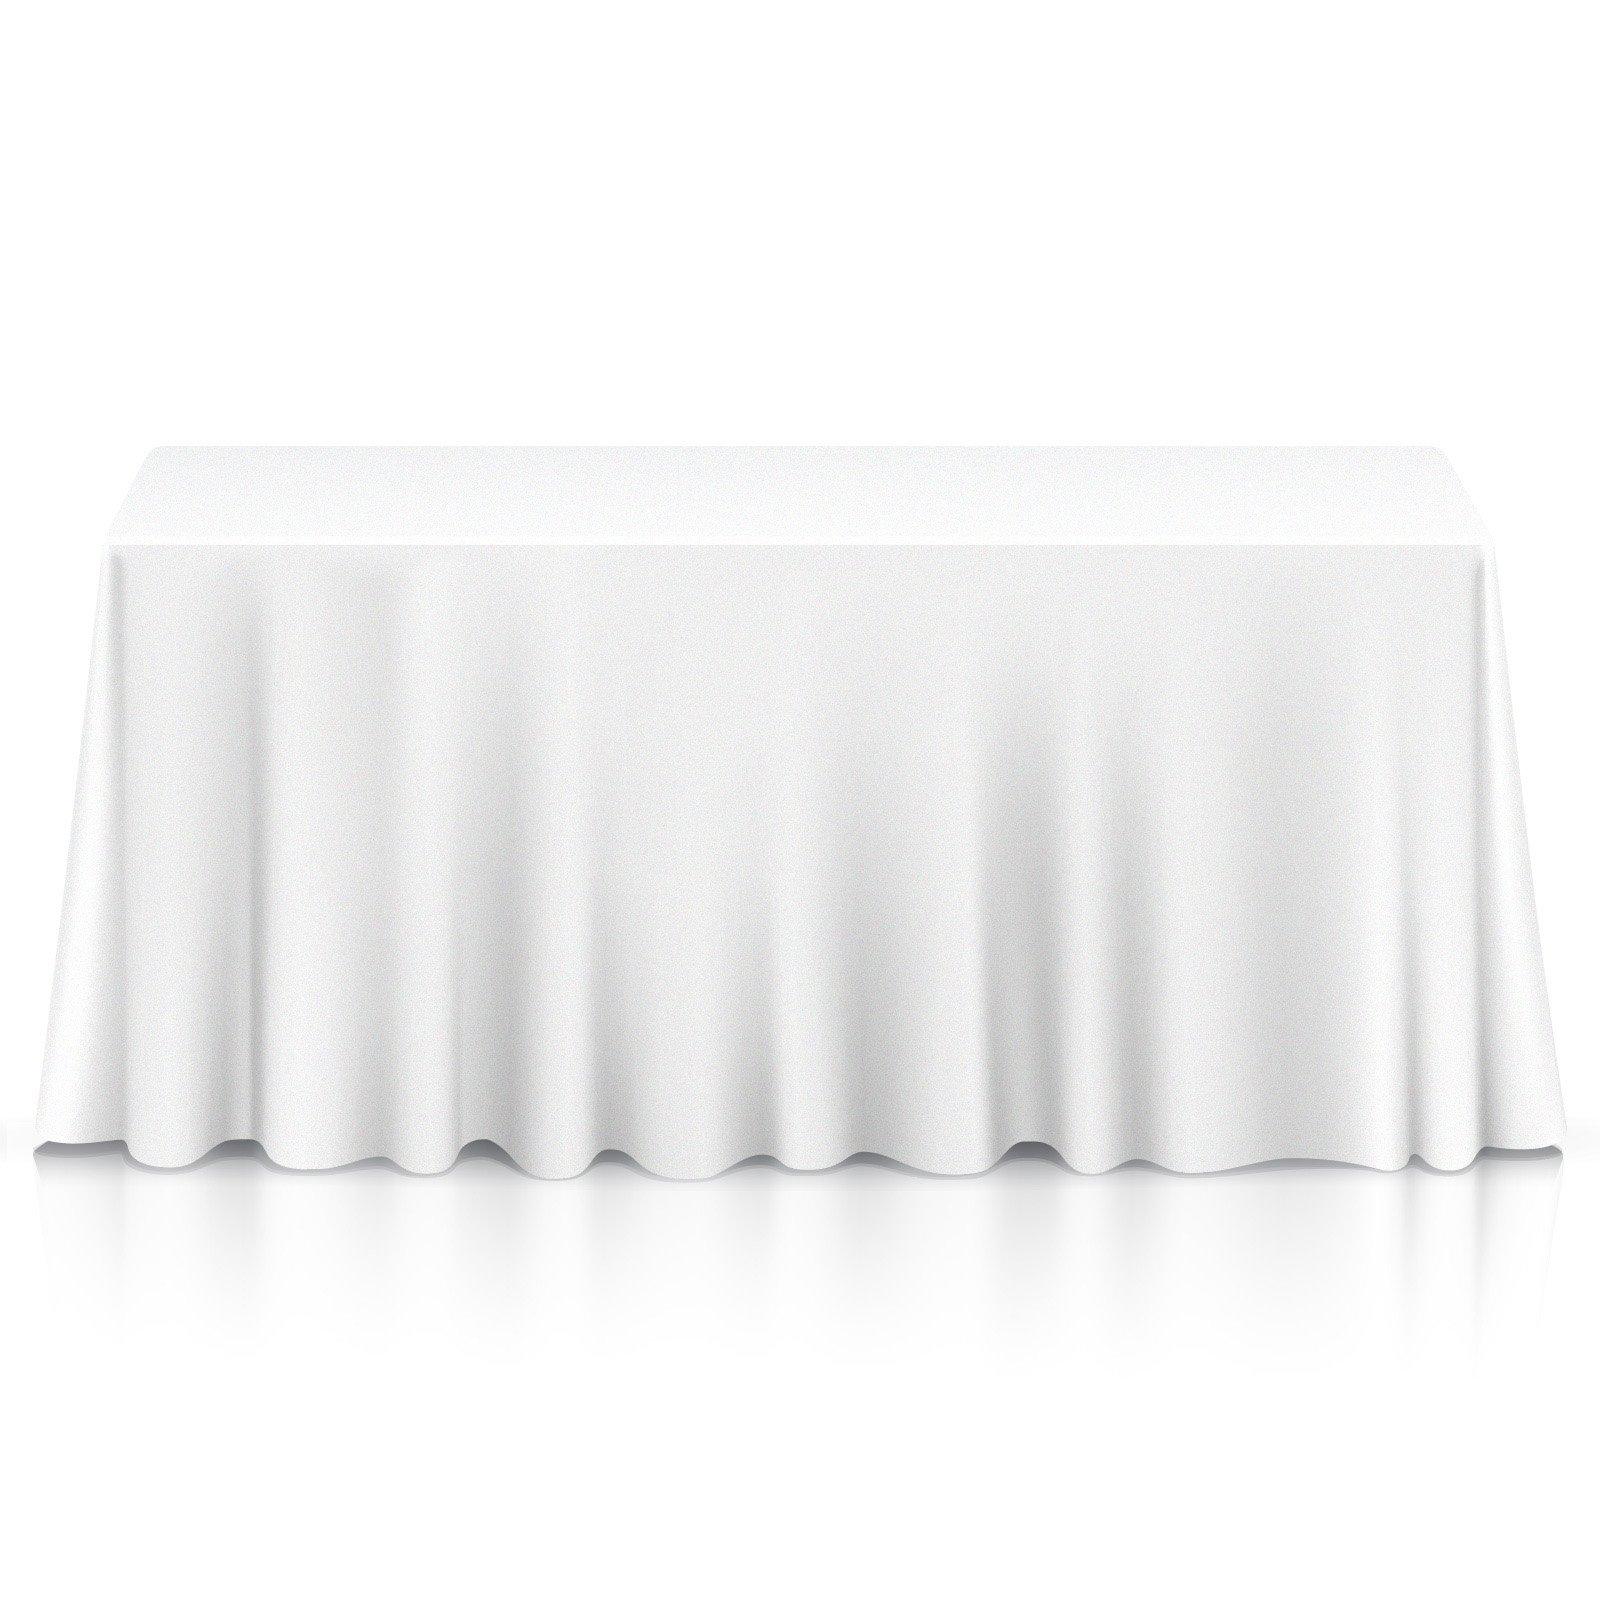 Lann's Linens - 90'' x 132'' Premium Tablecloth for Wedding/Banquet/Restaurant - Rectangular Polyester Fabric Table Cloth - White by Lann's Linens